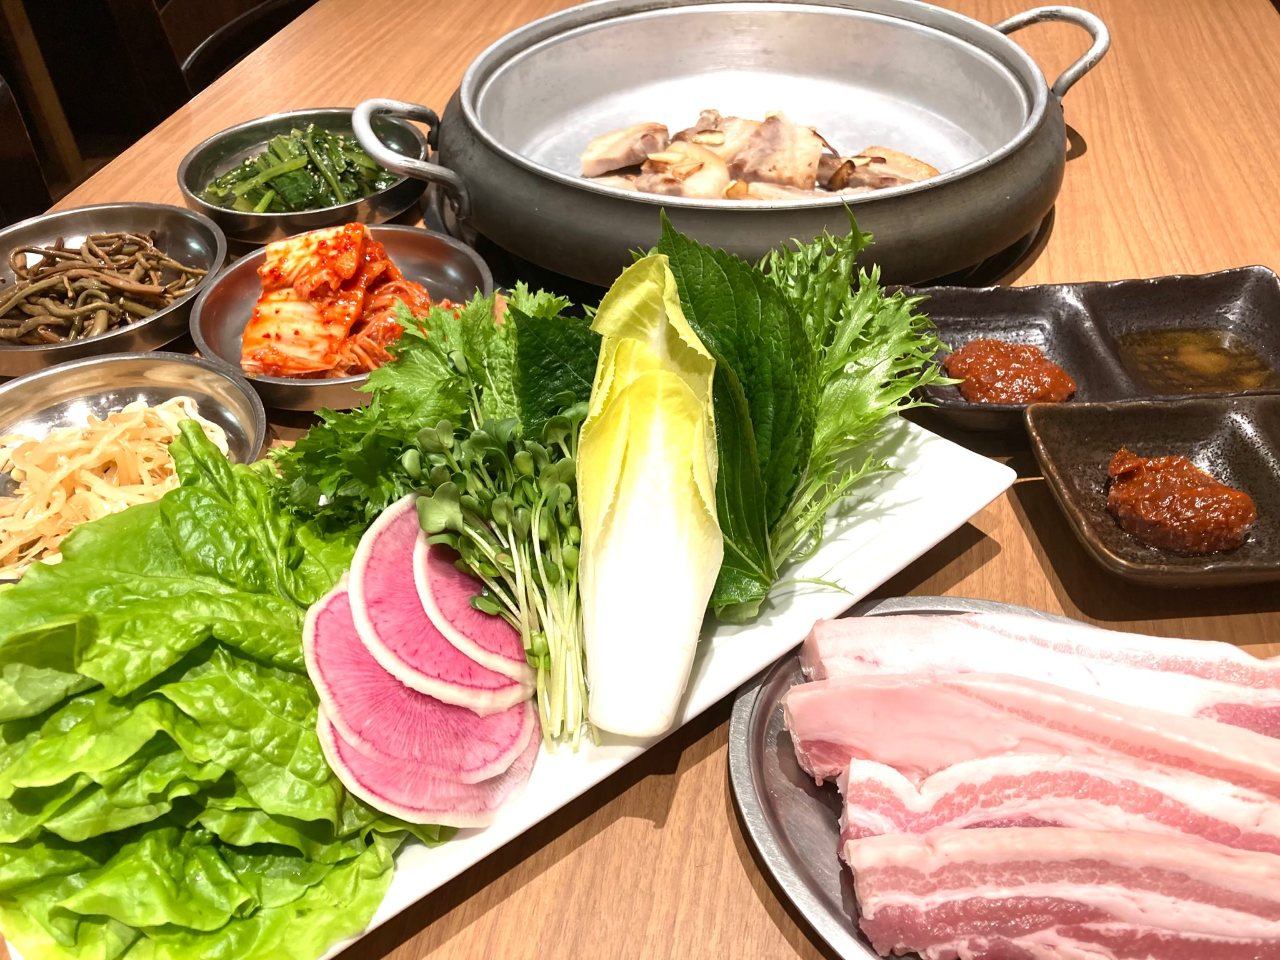 KOREAN KITCHEN ハンマル 勝川店のイメージ写真